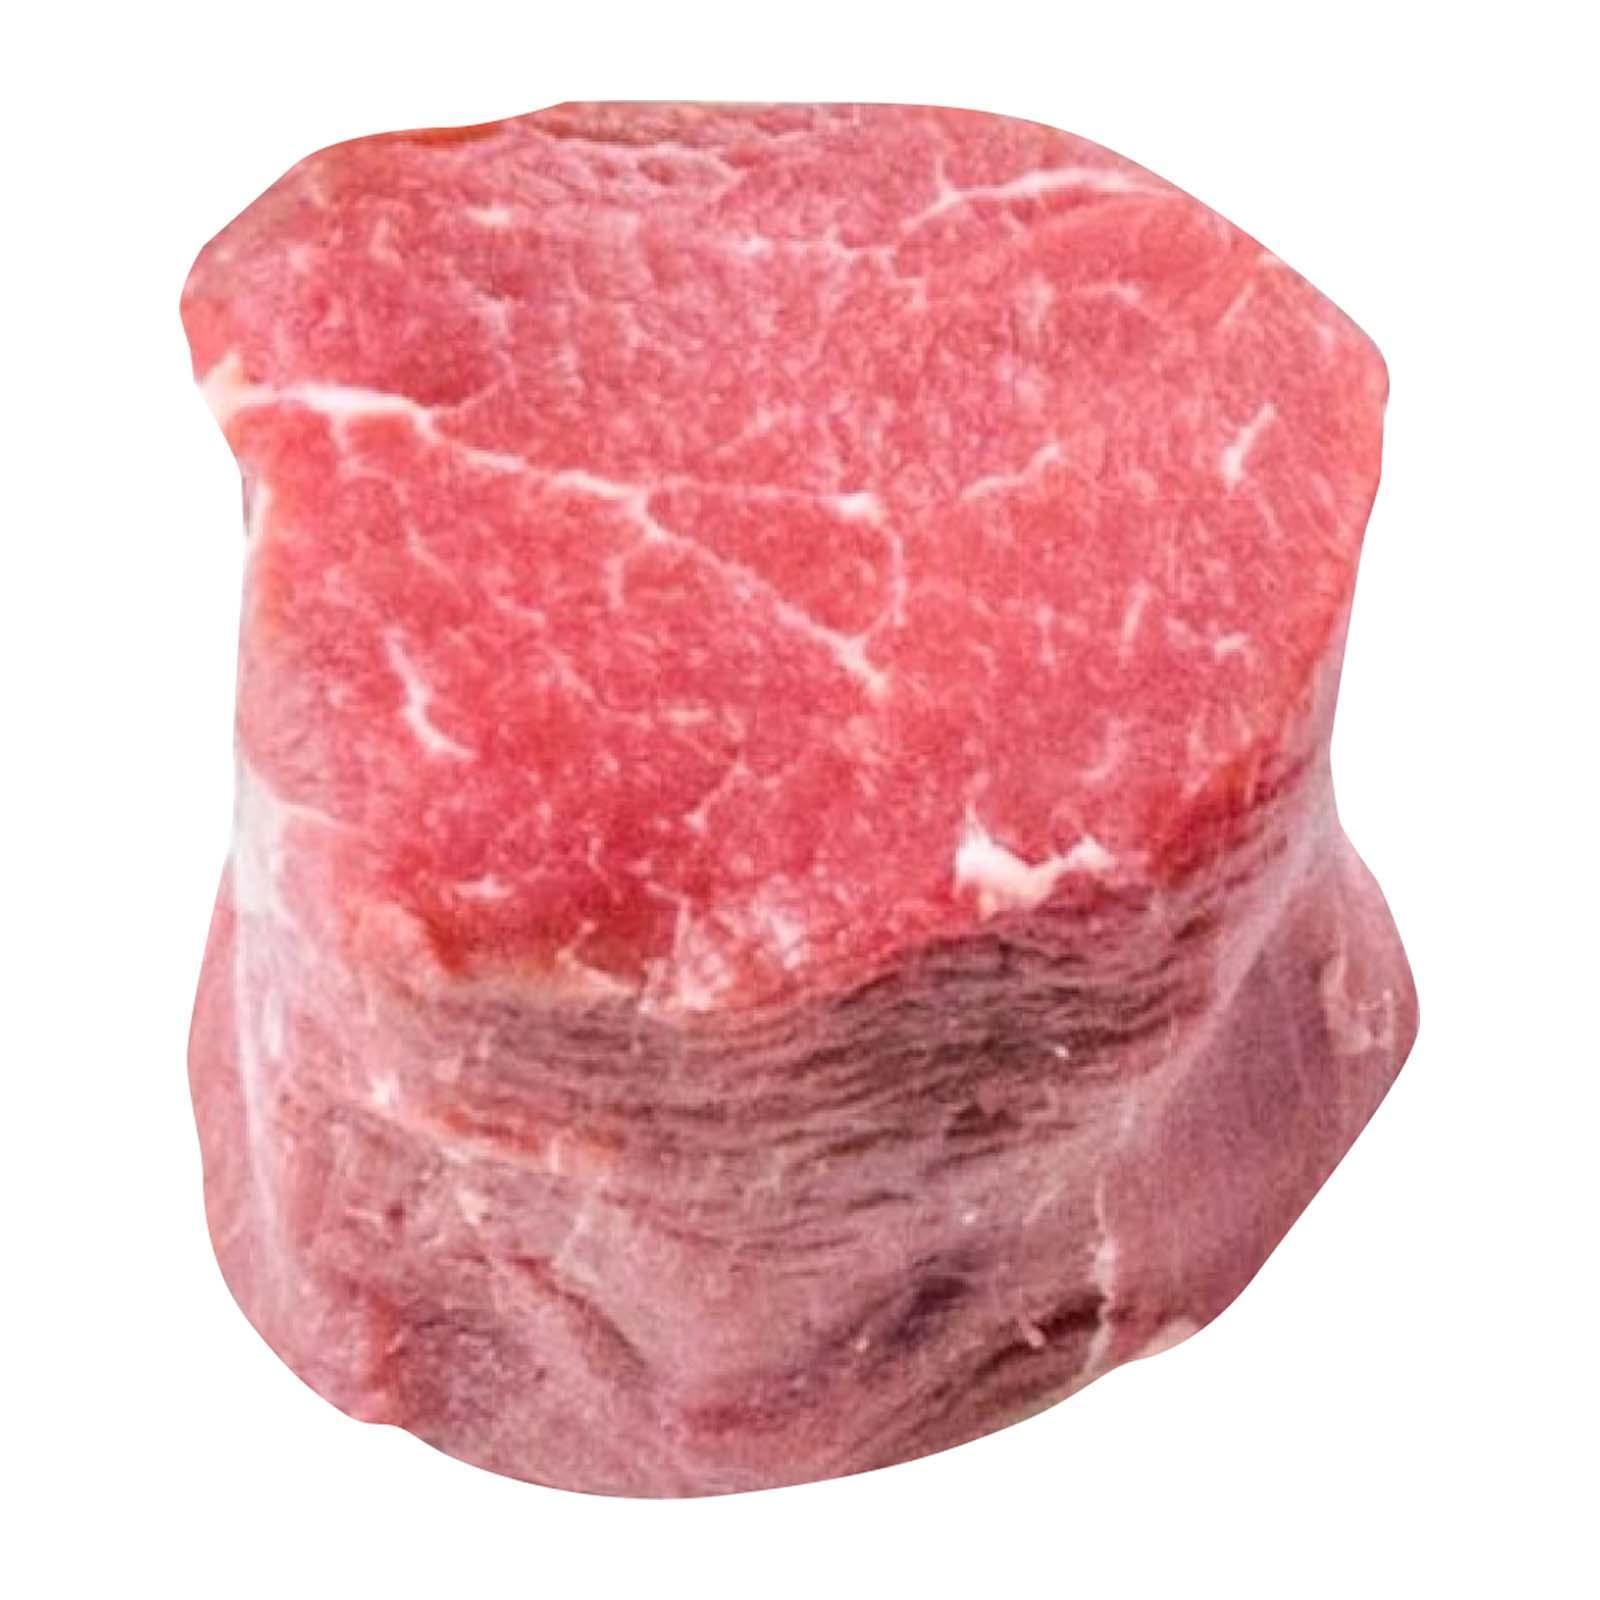 Master Grocer Australia Black Angus Grainfed Beef Tenderloin - Chilled